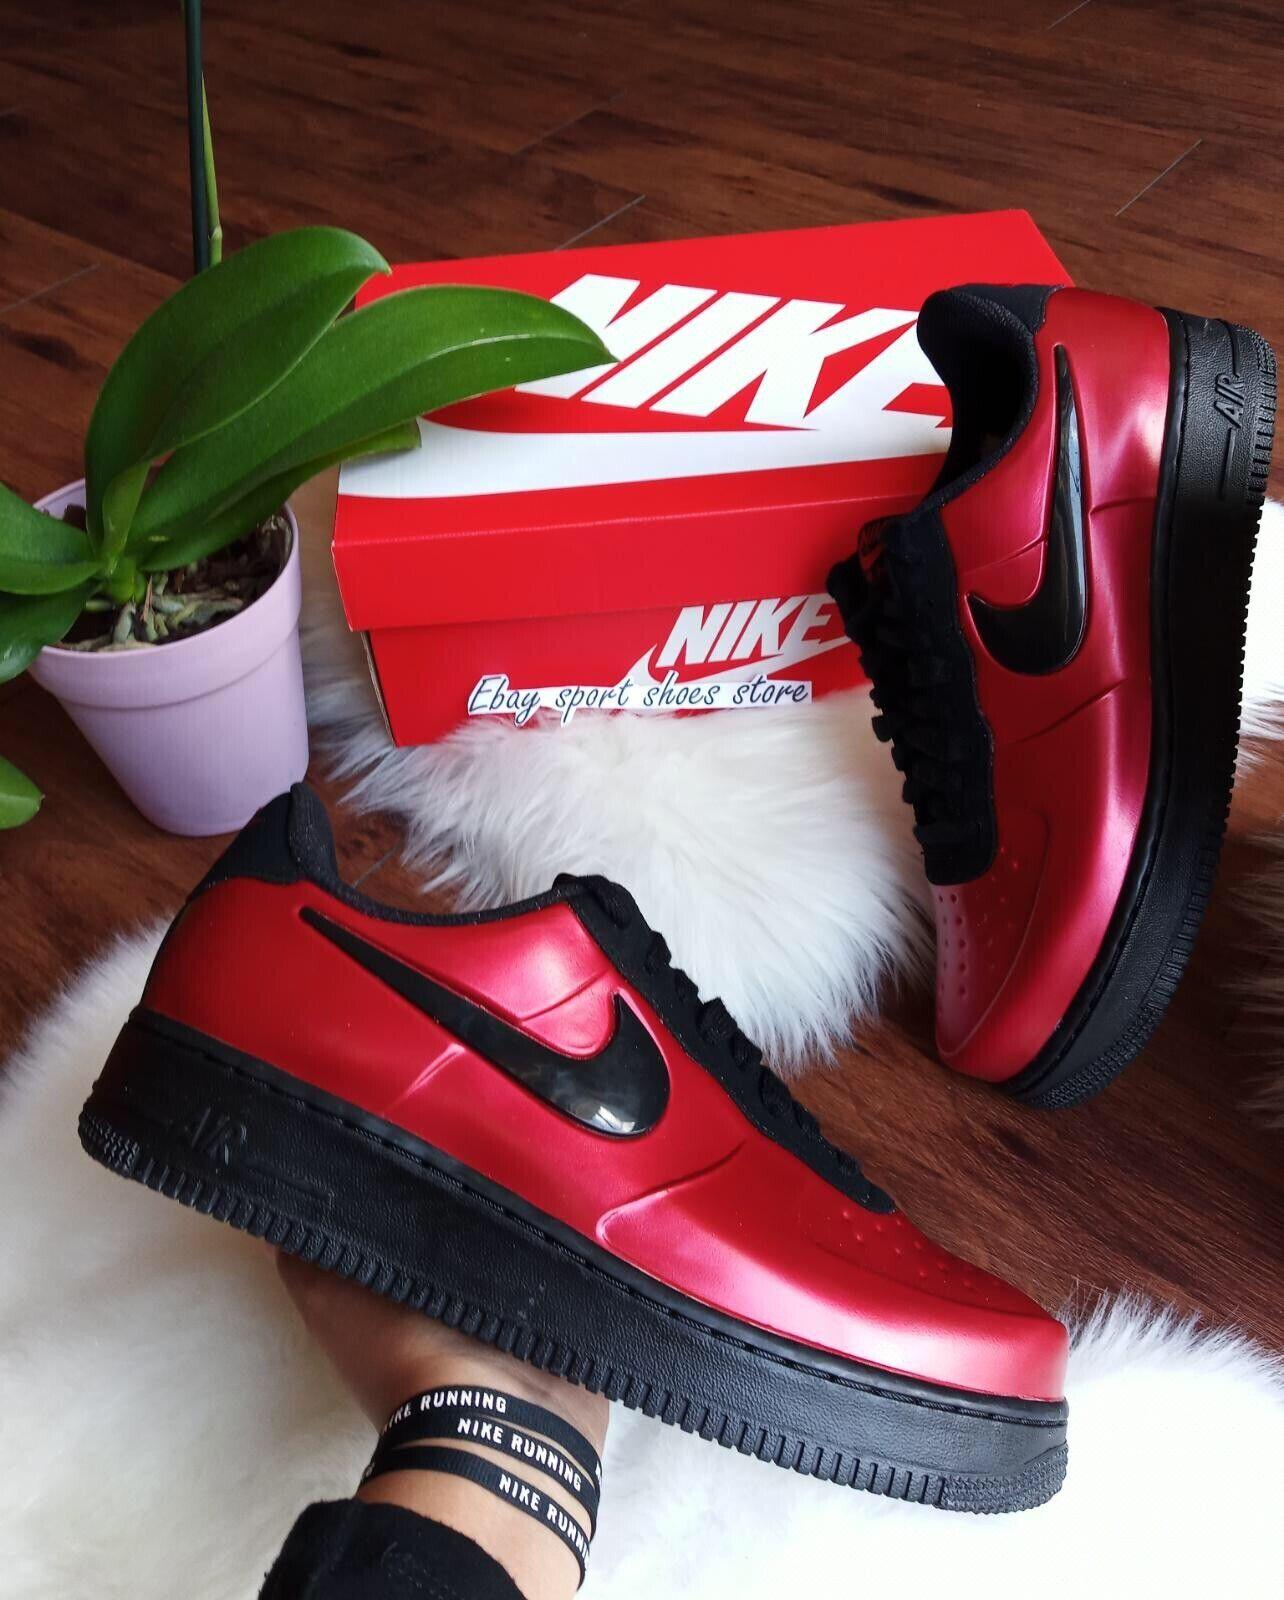 Tamaño 8.5 AR1 para Hombre Nike Foamposite Pro Copa Gimnasio Rojo Negro AJ3664 601 correr